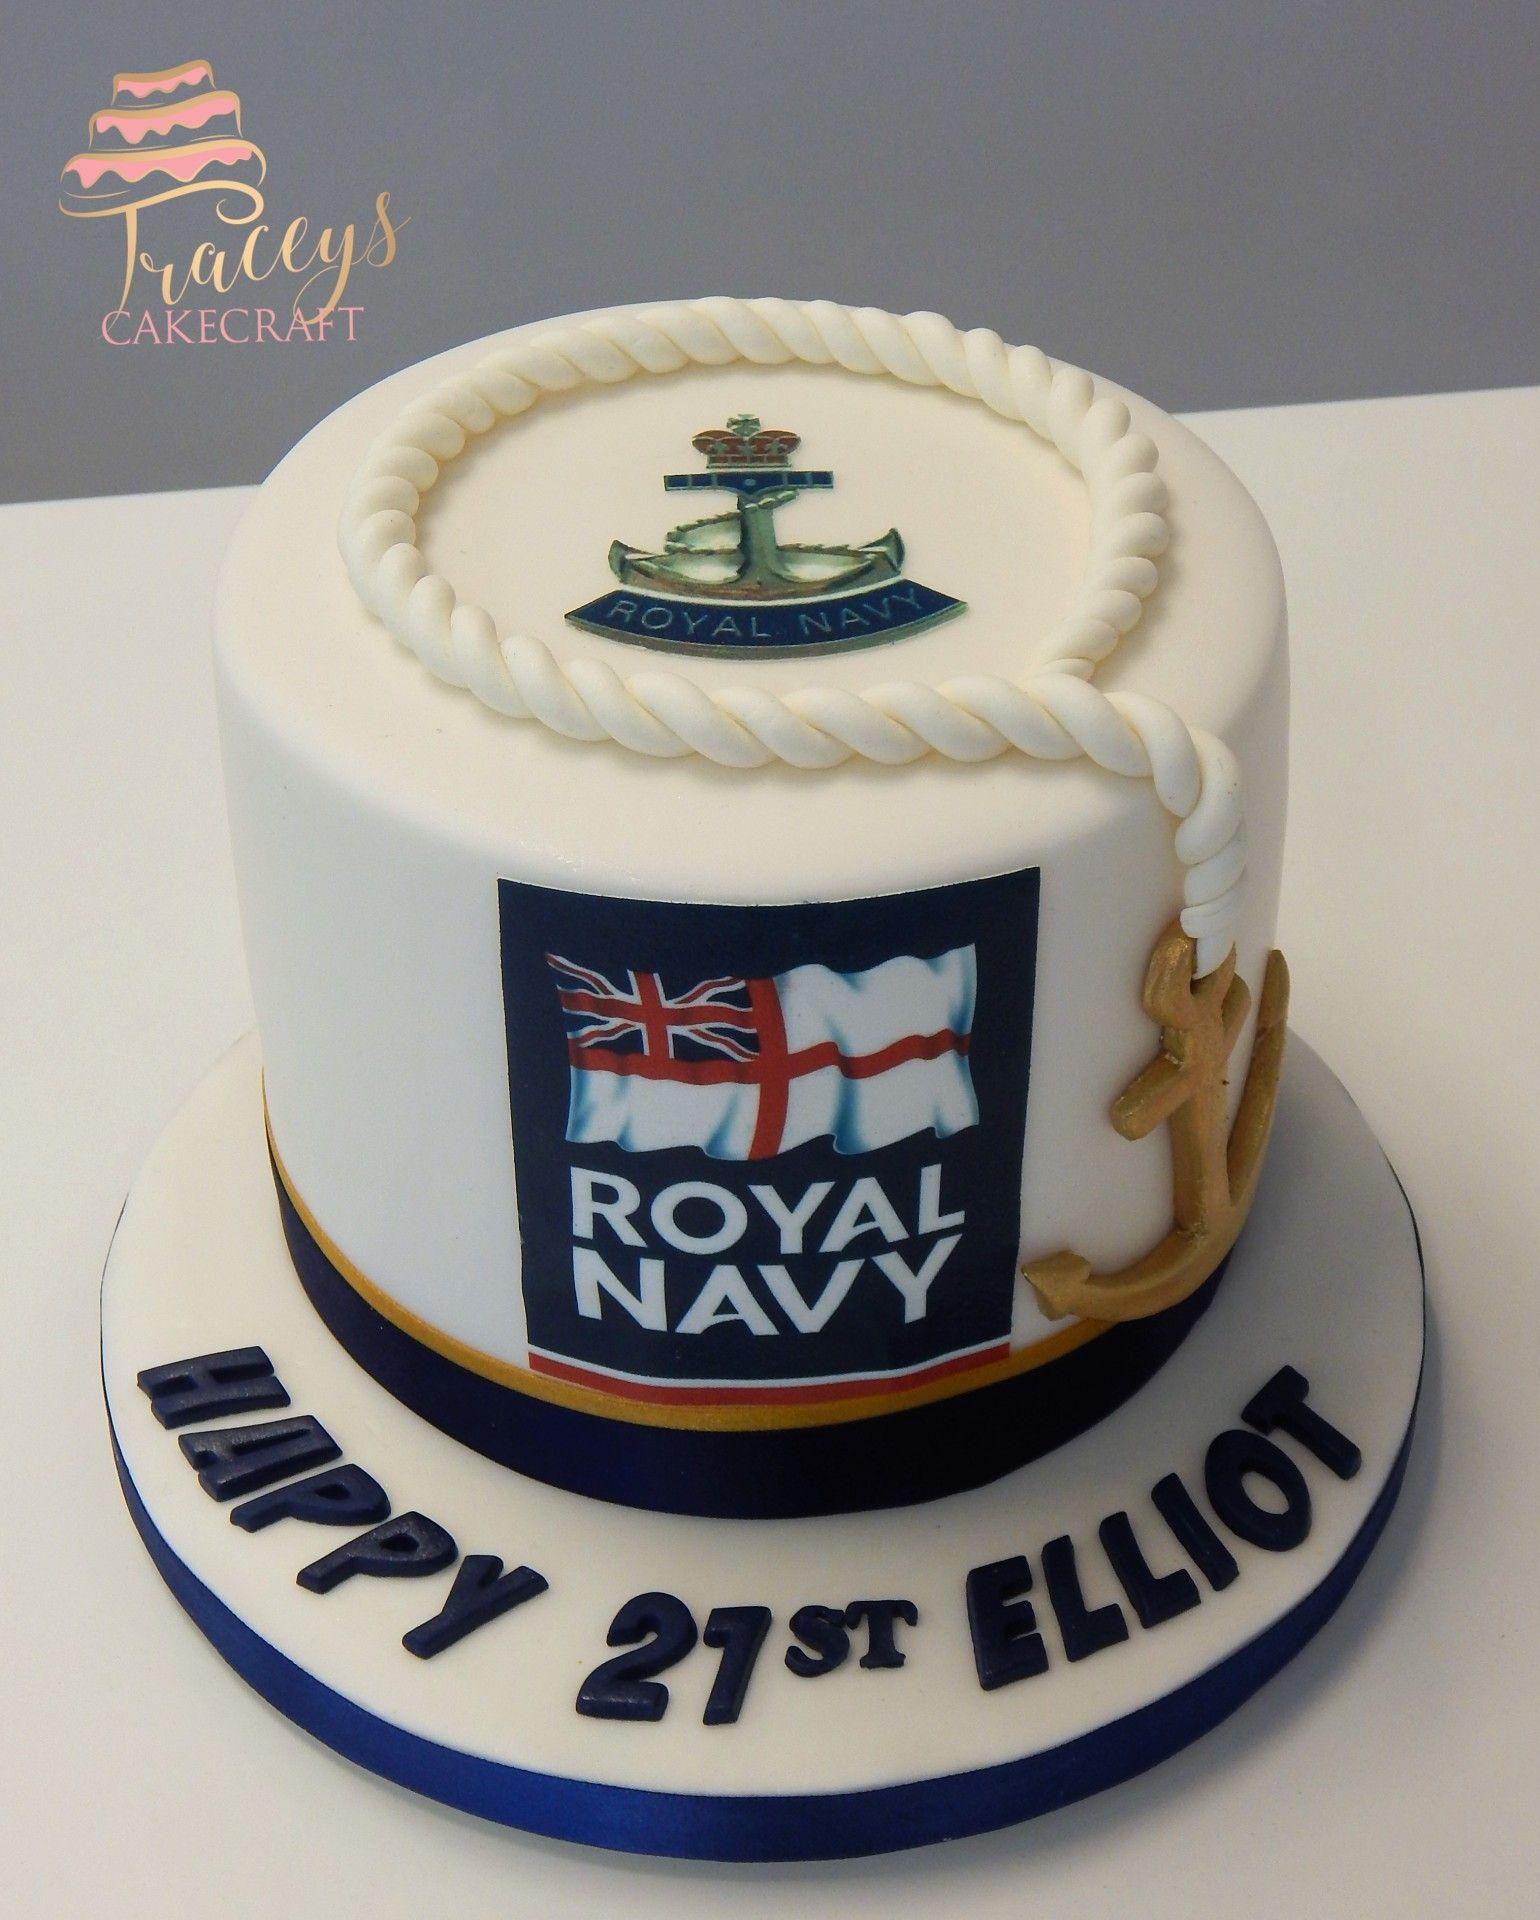 Incredible Royal Navy Birthday Cake Navy Cakes Boat Cake Navy Birthday Funny Birthday Cards Online Fluifree Goldxyz